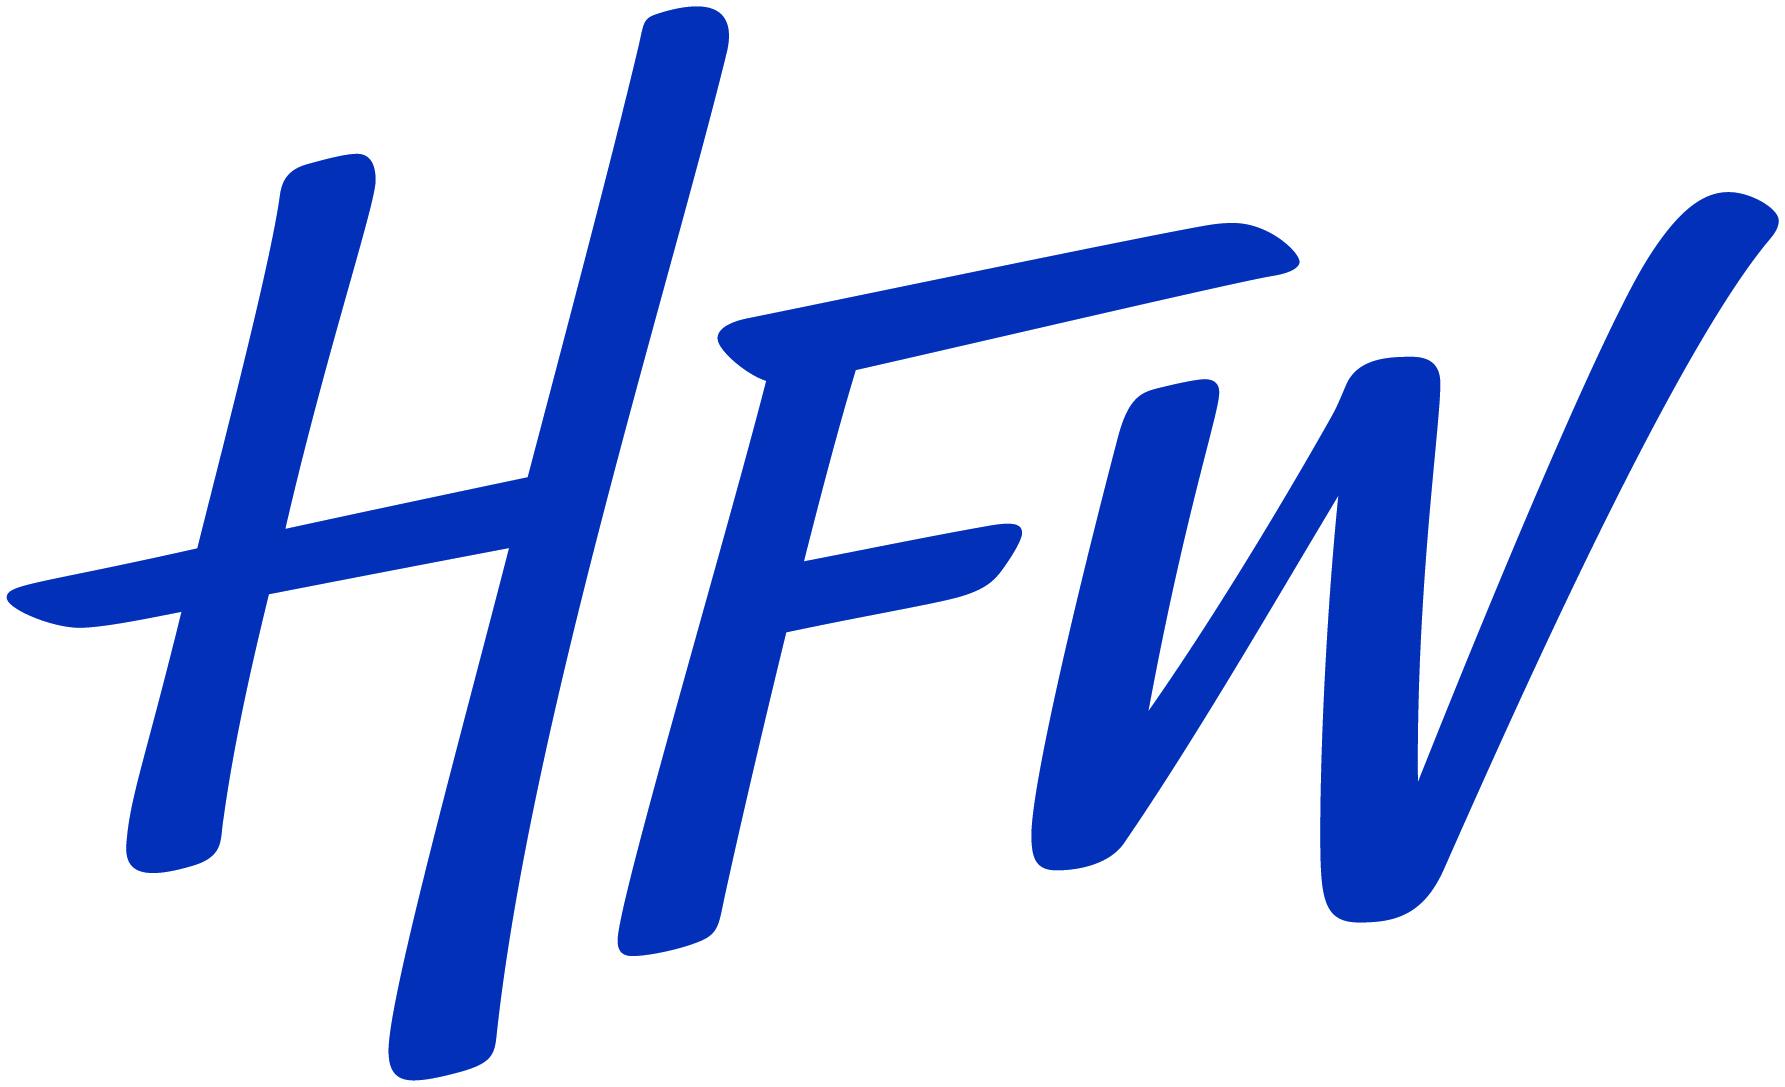 HFW_Standard_CMYK_Dark Blue.jpg